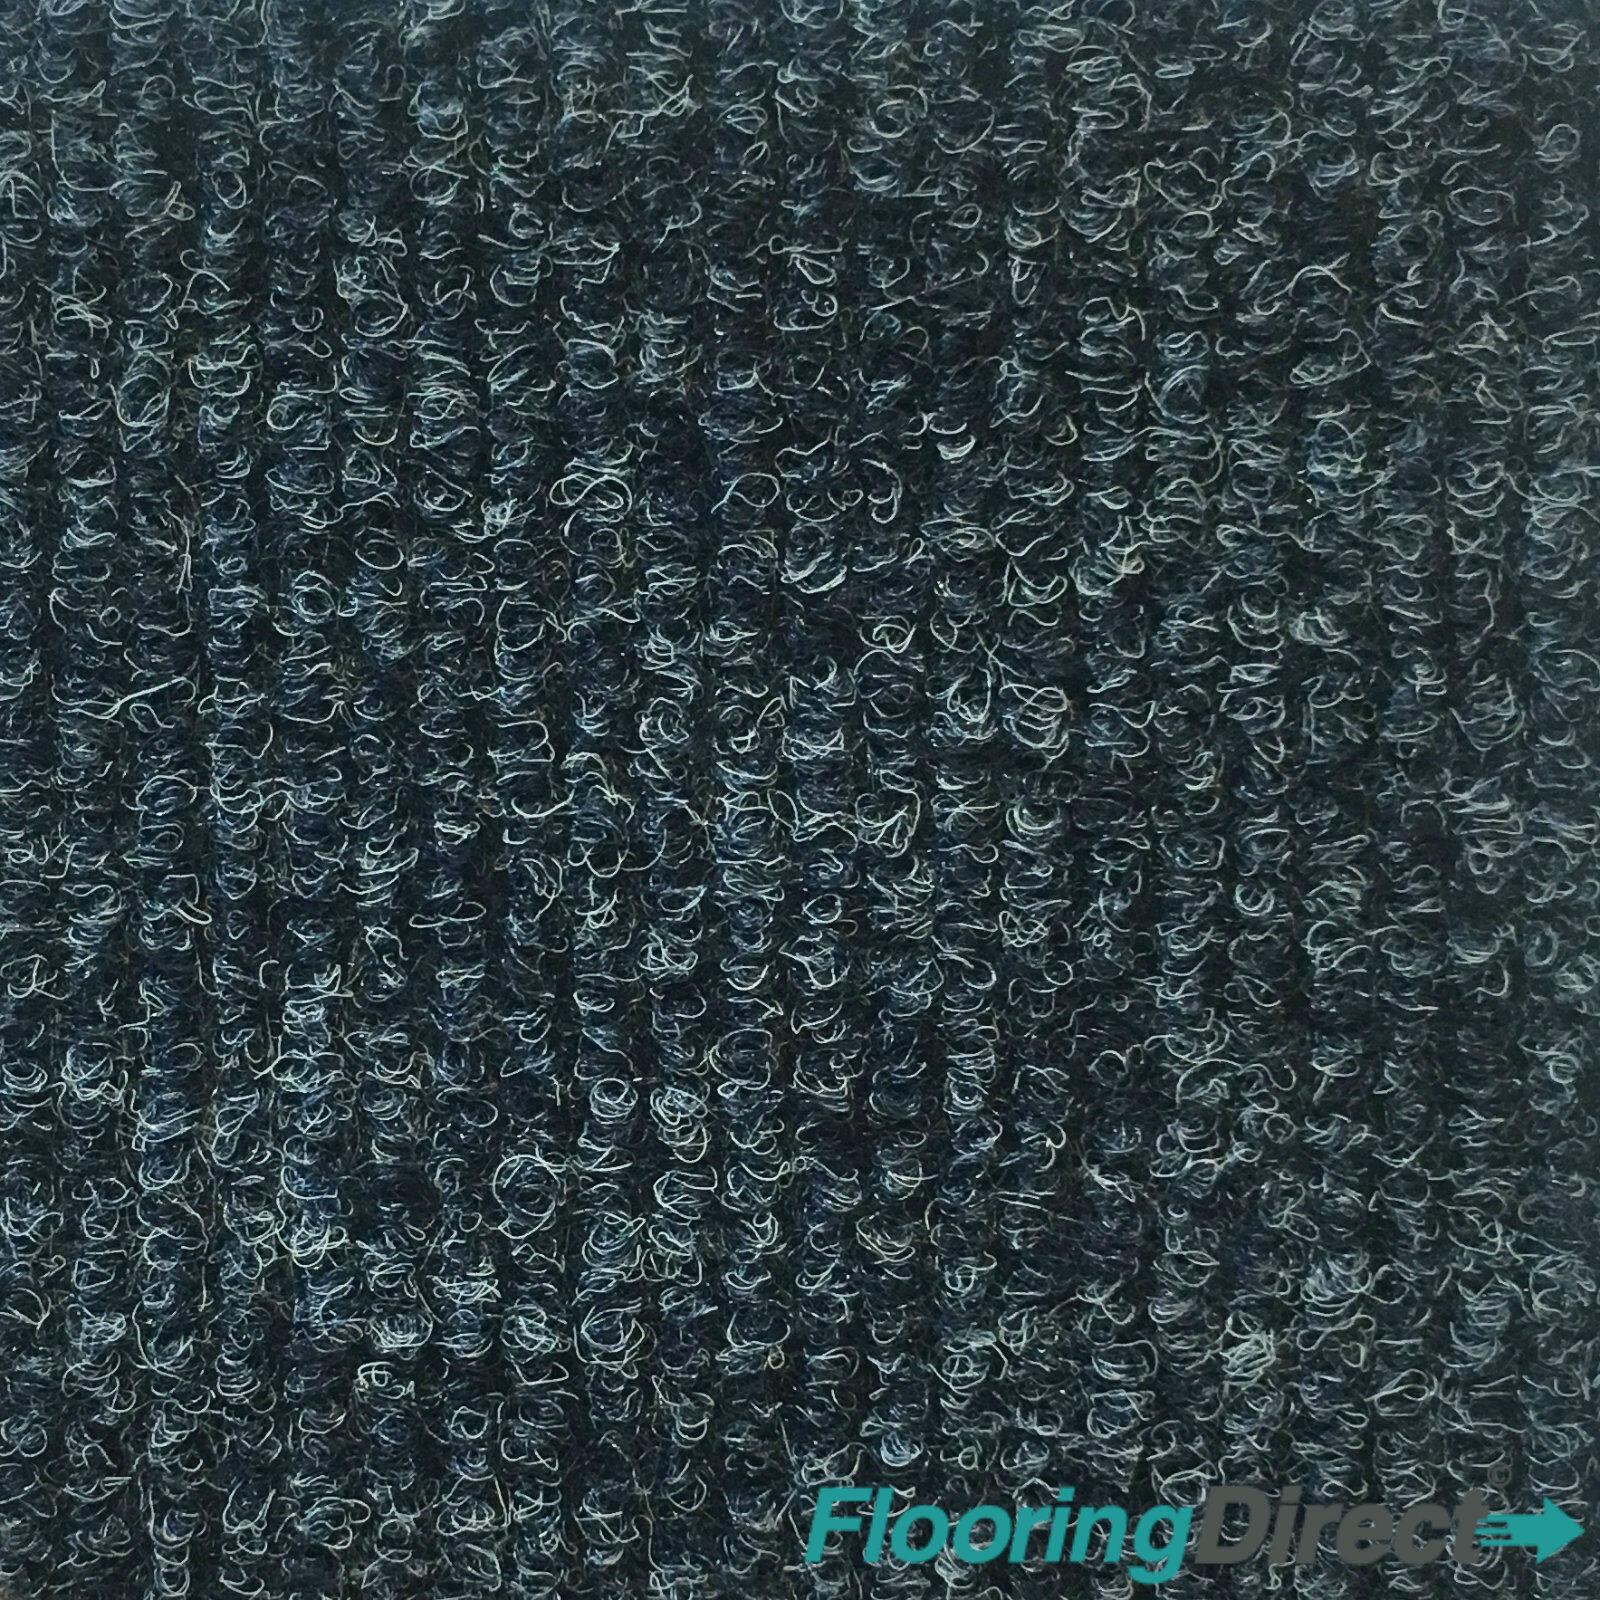 Image of: Midnight Blue Office Carpet Tiles 6m2 Box Home Office Flooring Cheap Price Ebay